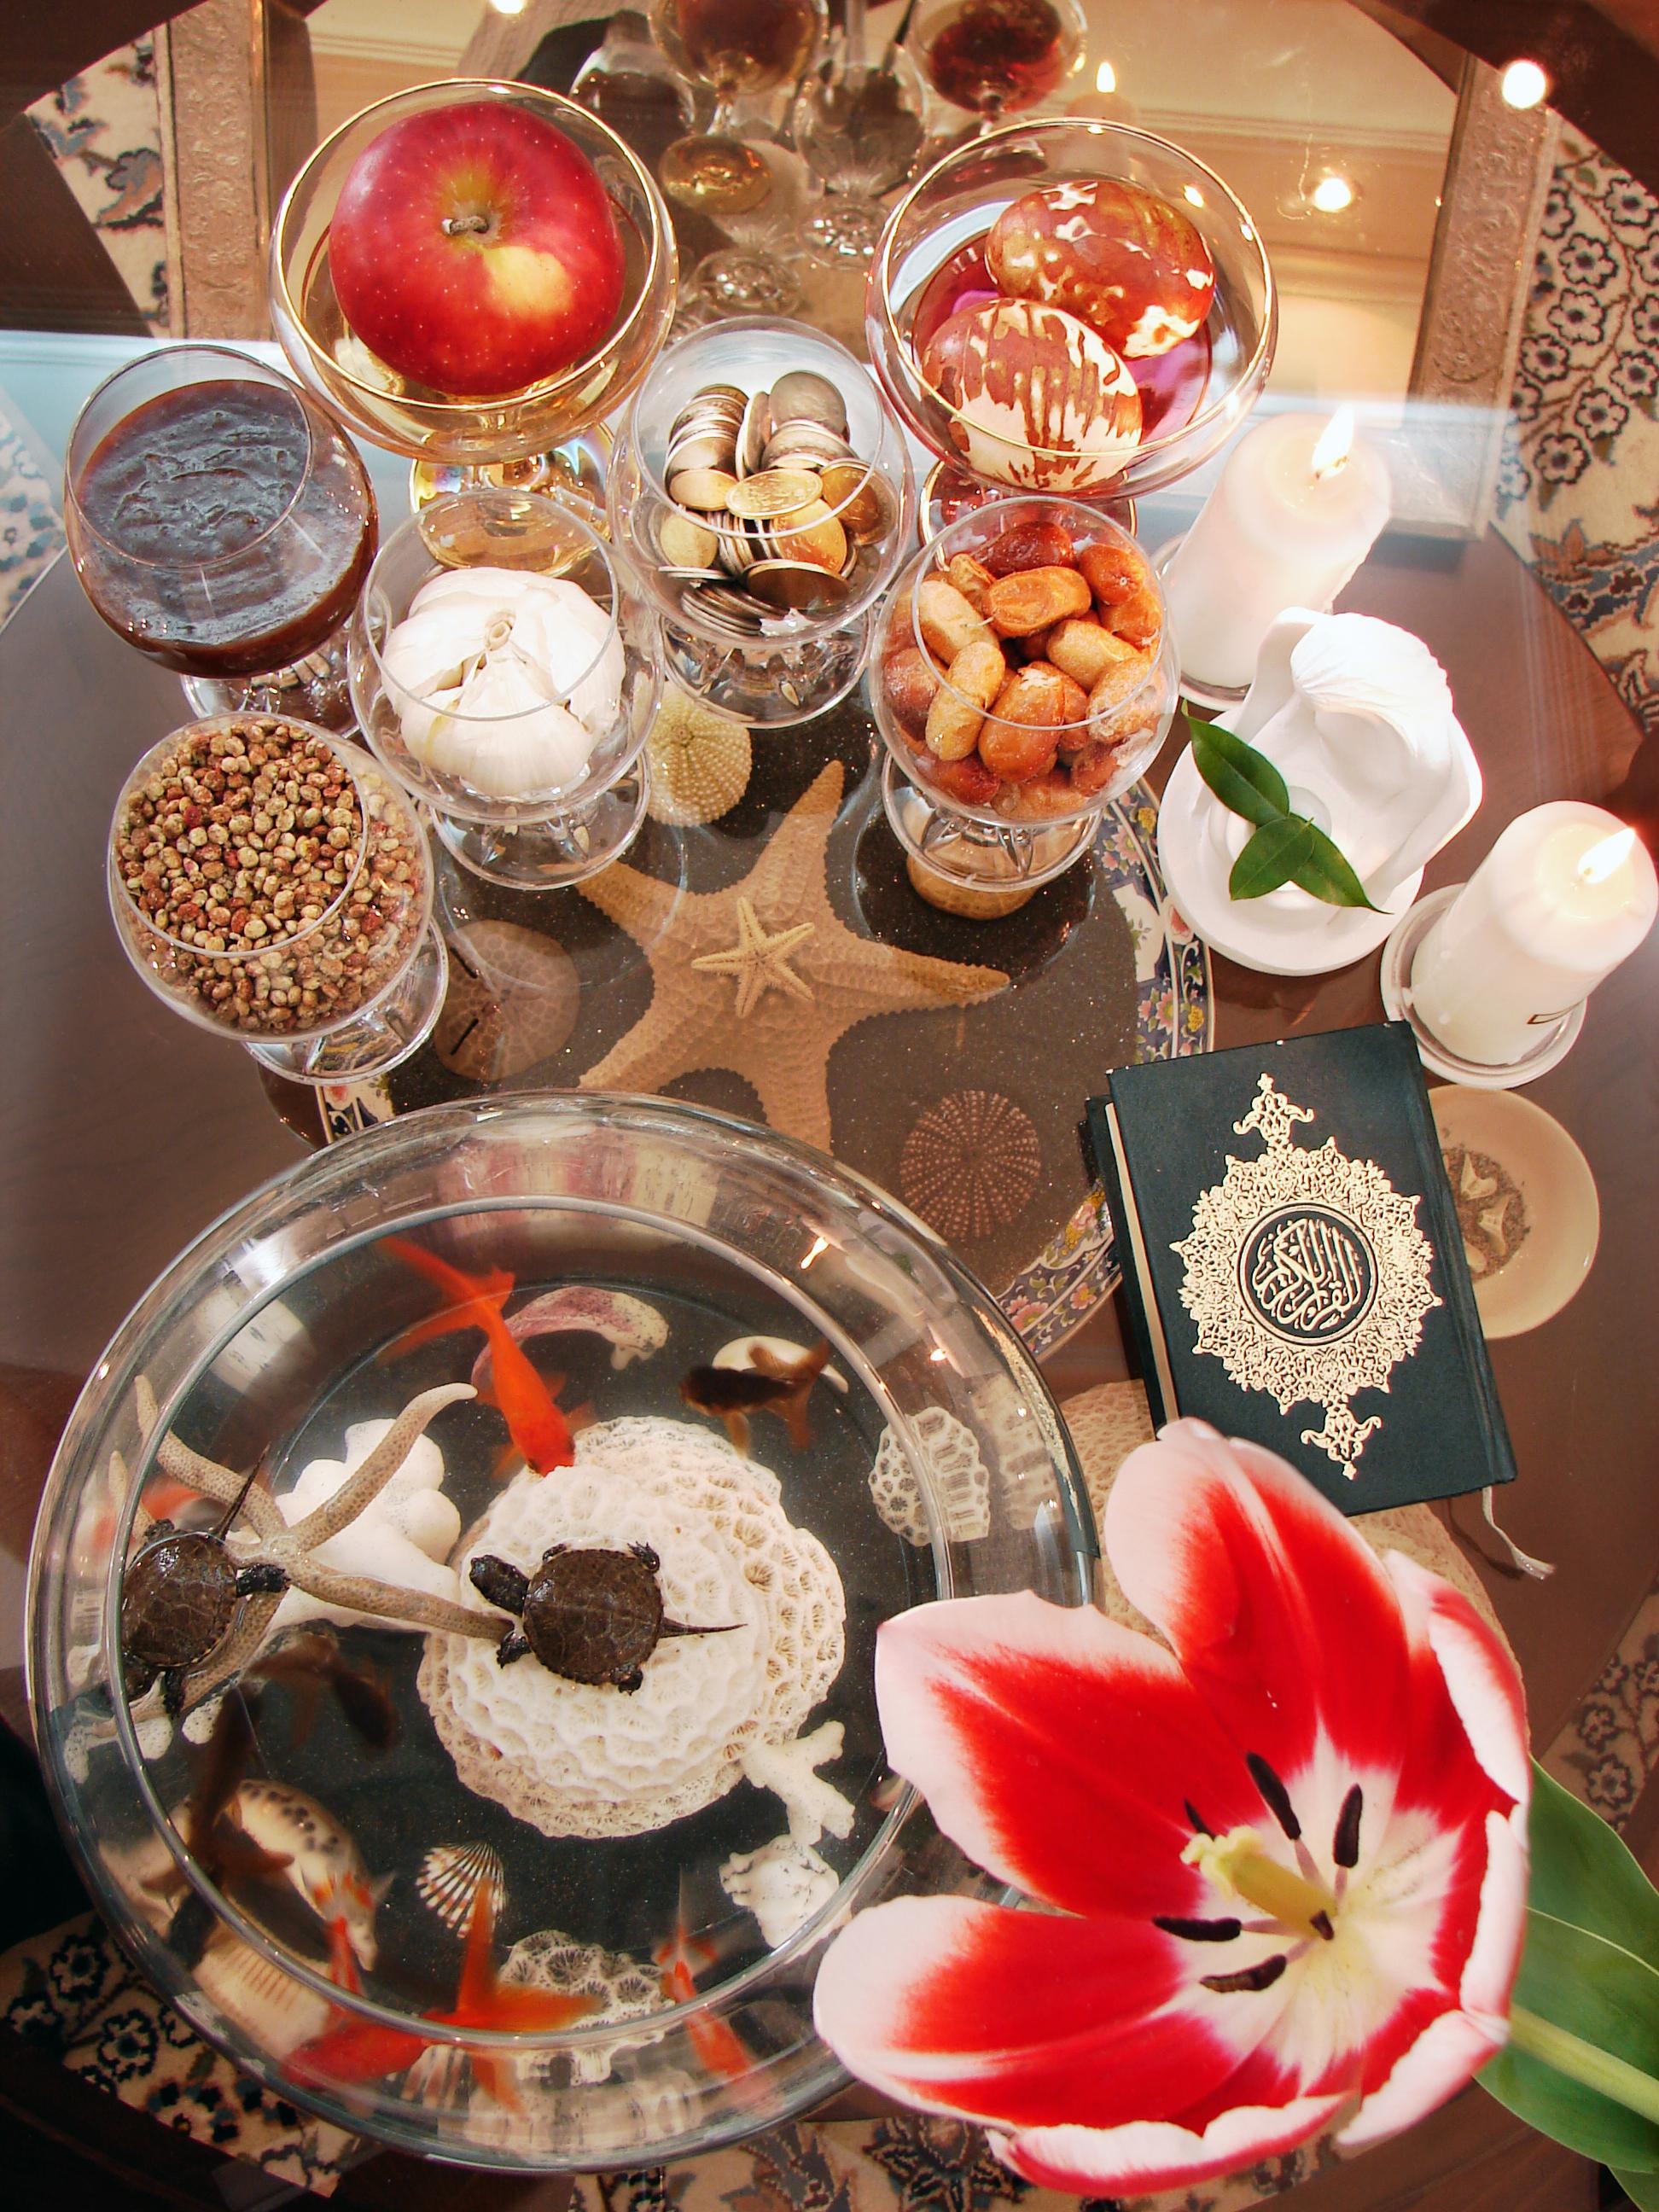 File:Iranian New Year Haft Sin.jpg - Wikimedia Commons Persian Haft Seen